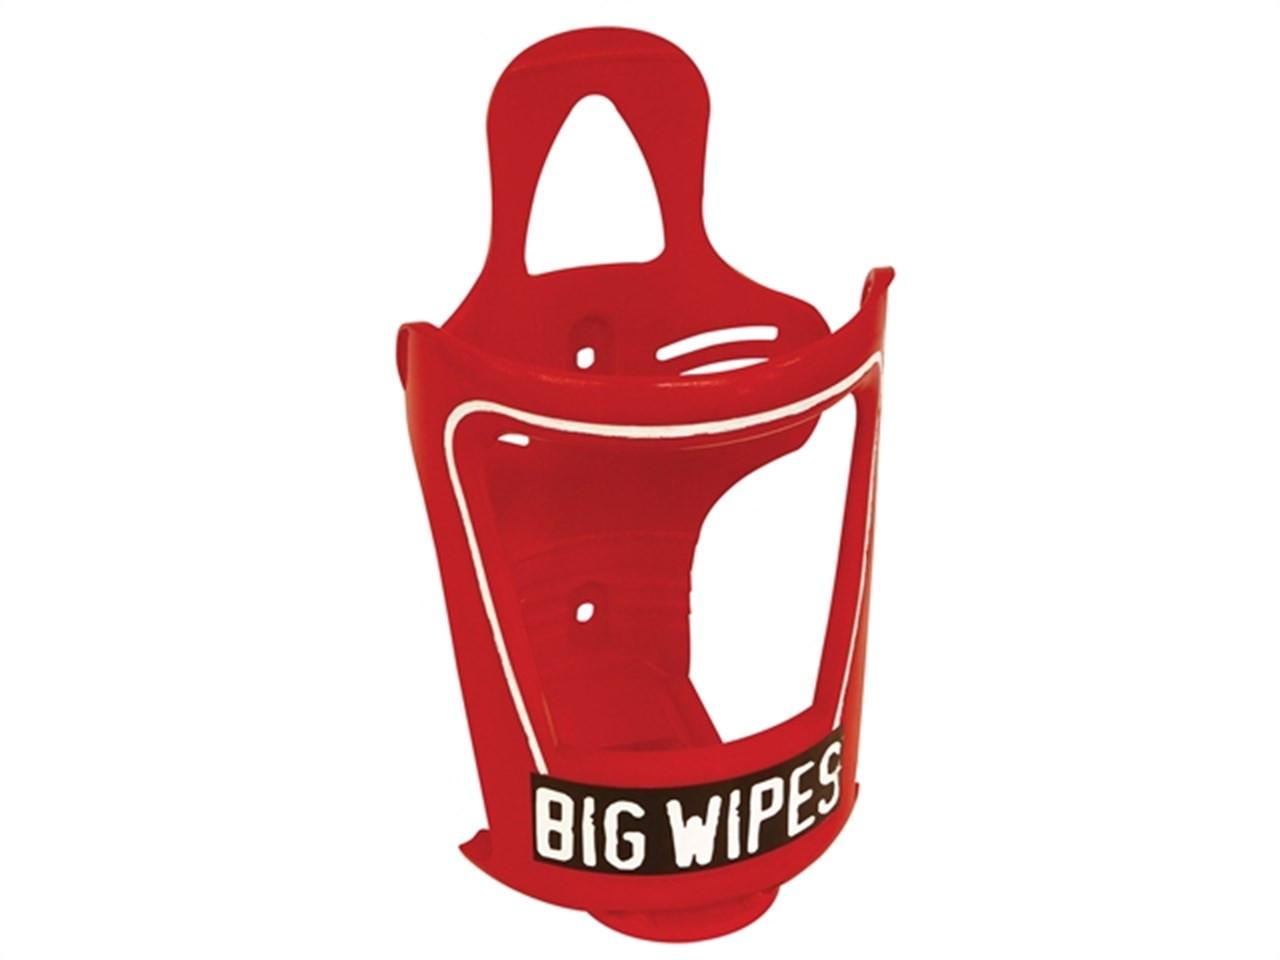 BigWipes Bracket (For 80 Wipe Tub)